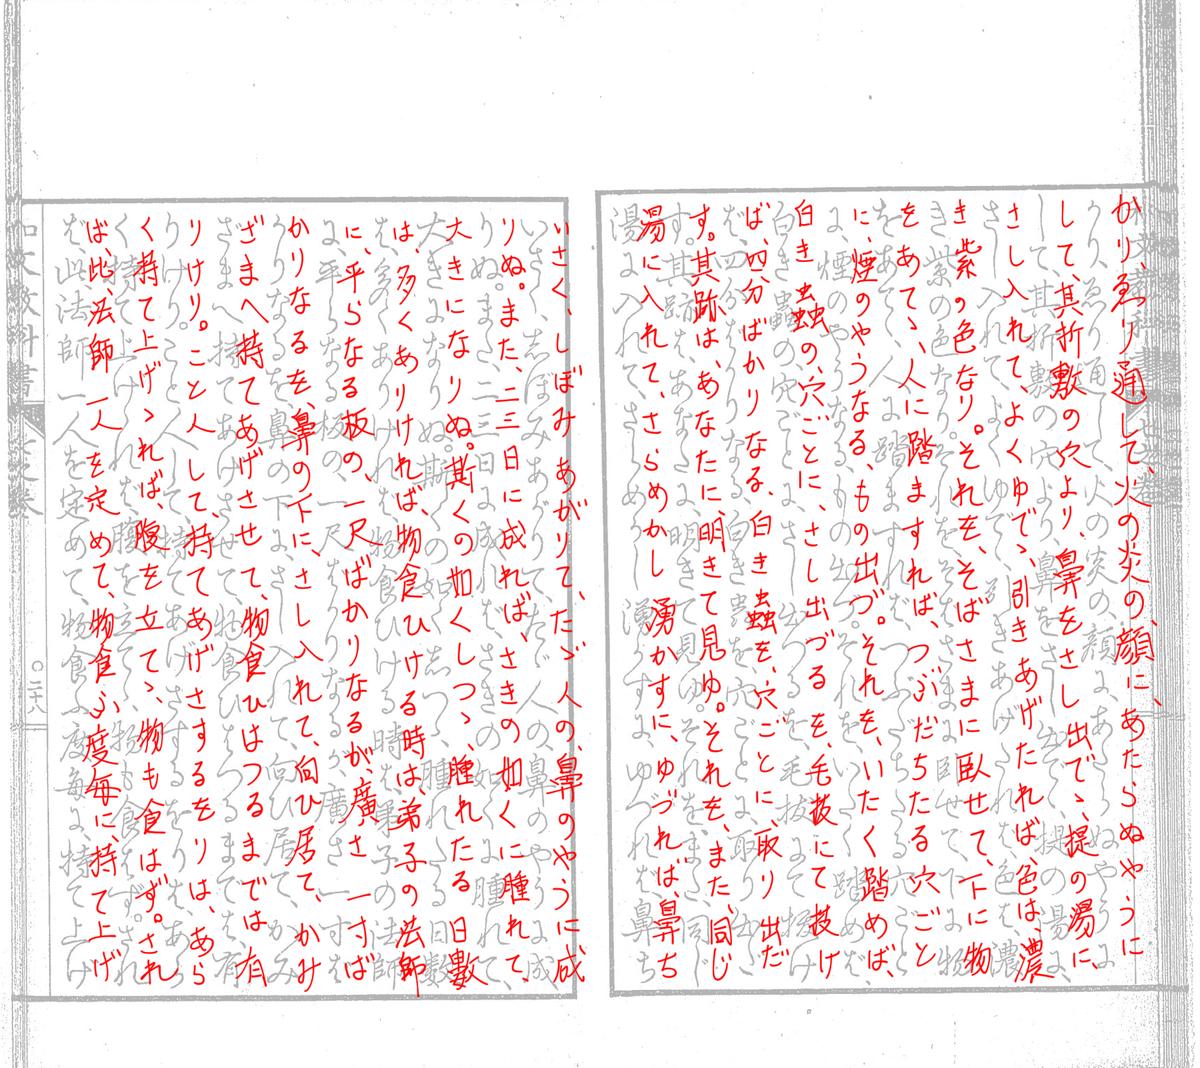 f:id:KihiminHamame:20200224220508j:plain